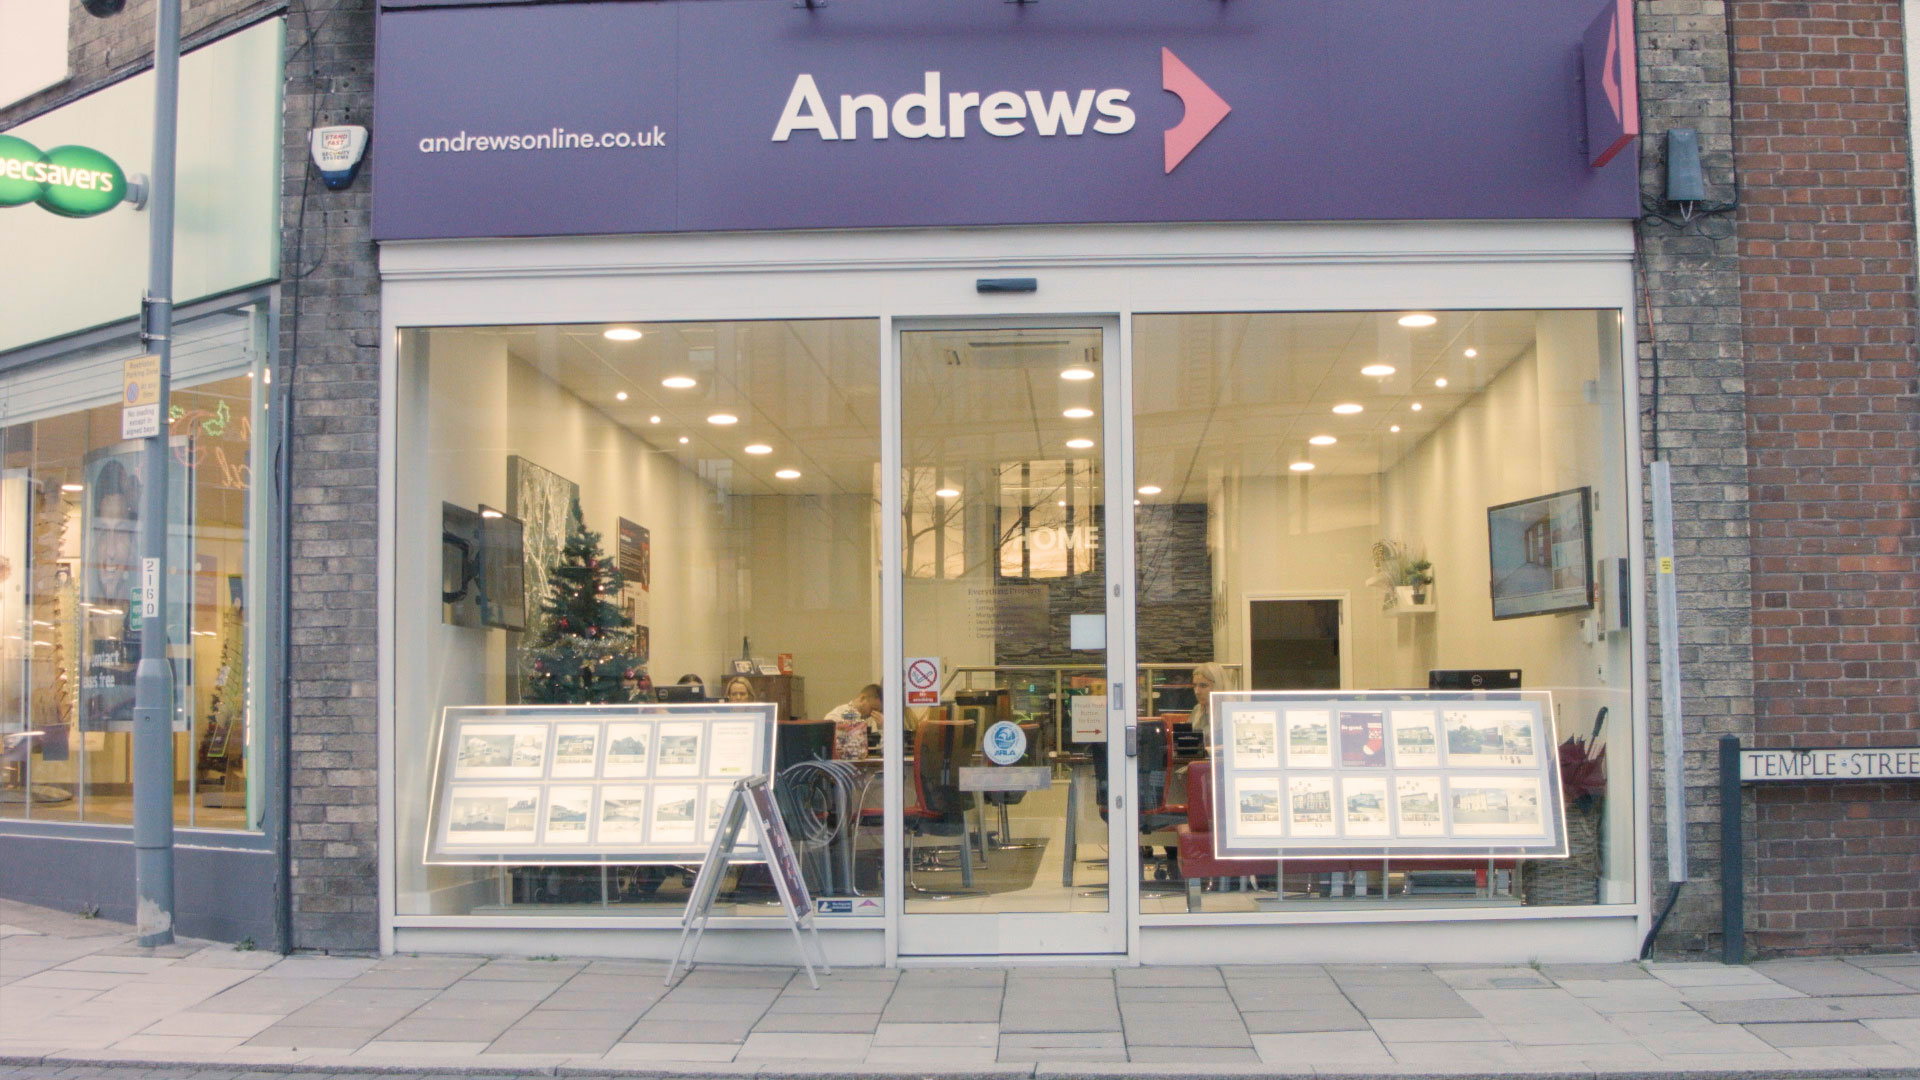 Andrews shop front